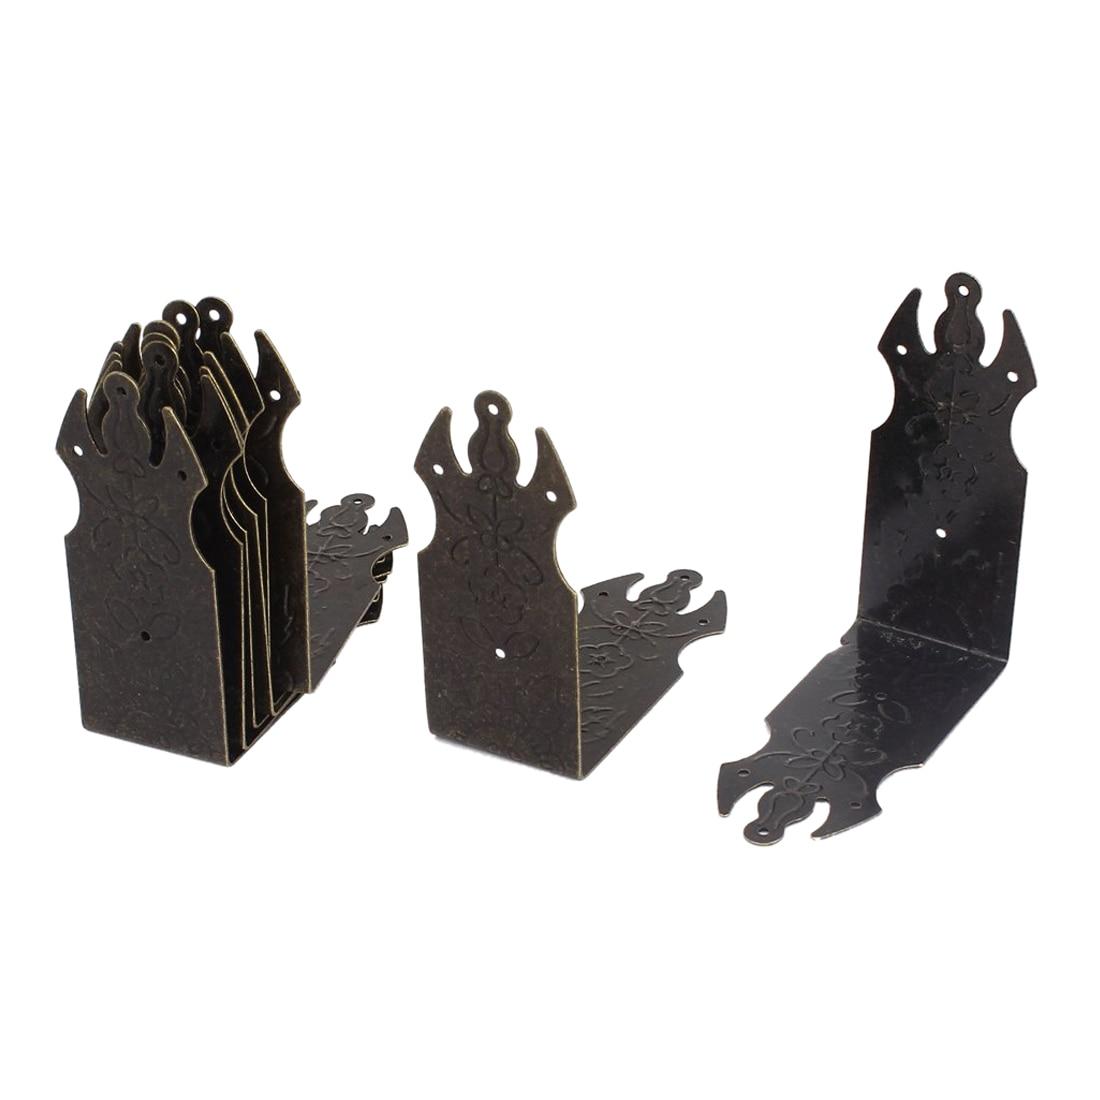 EWS  Chest Box Corners Decor Angle Plates Brace Protectors 70x70mm 8pcs keller charles melamine appetizer plates box of 6